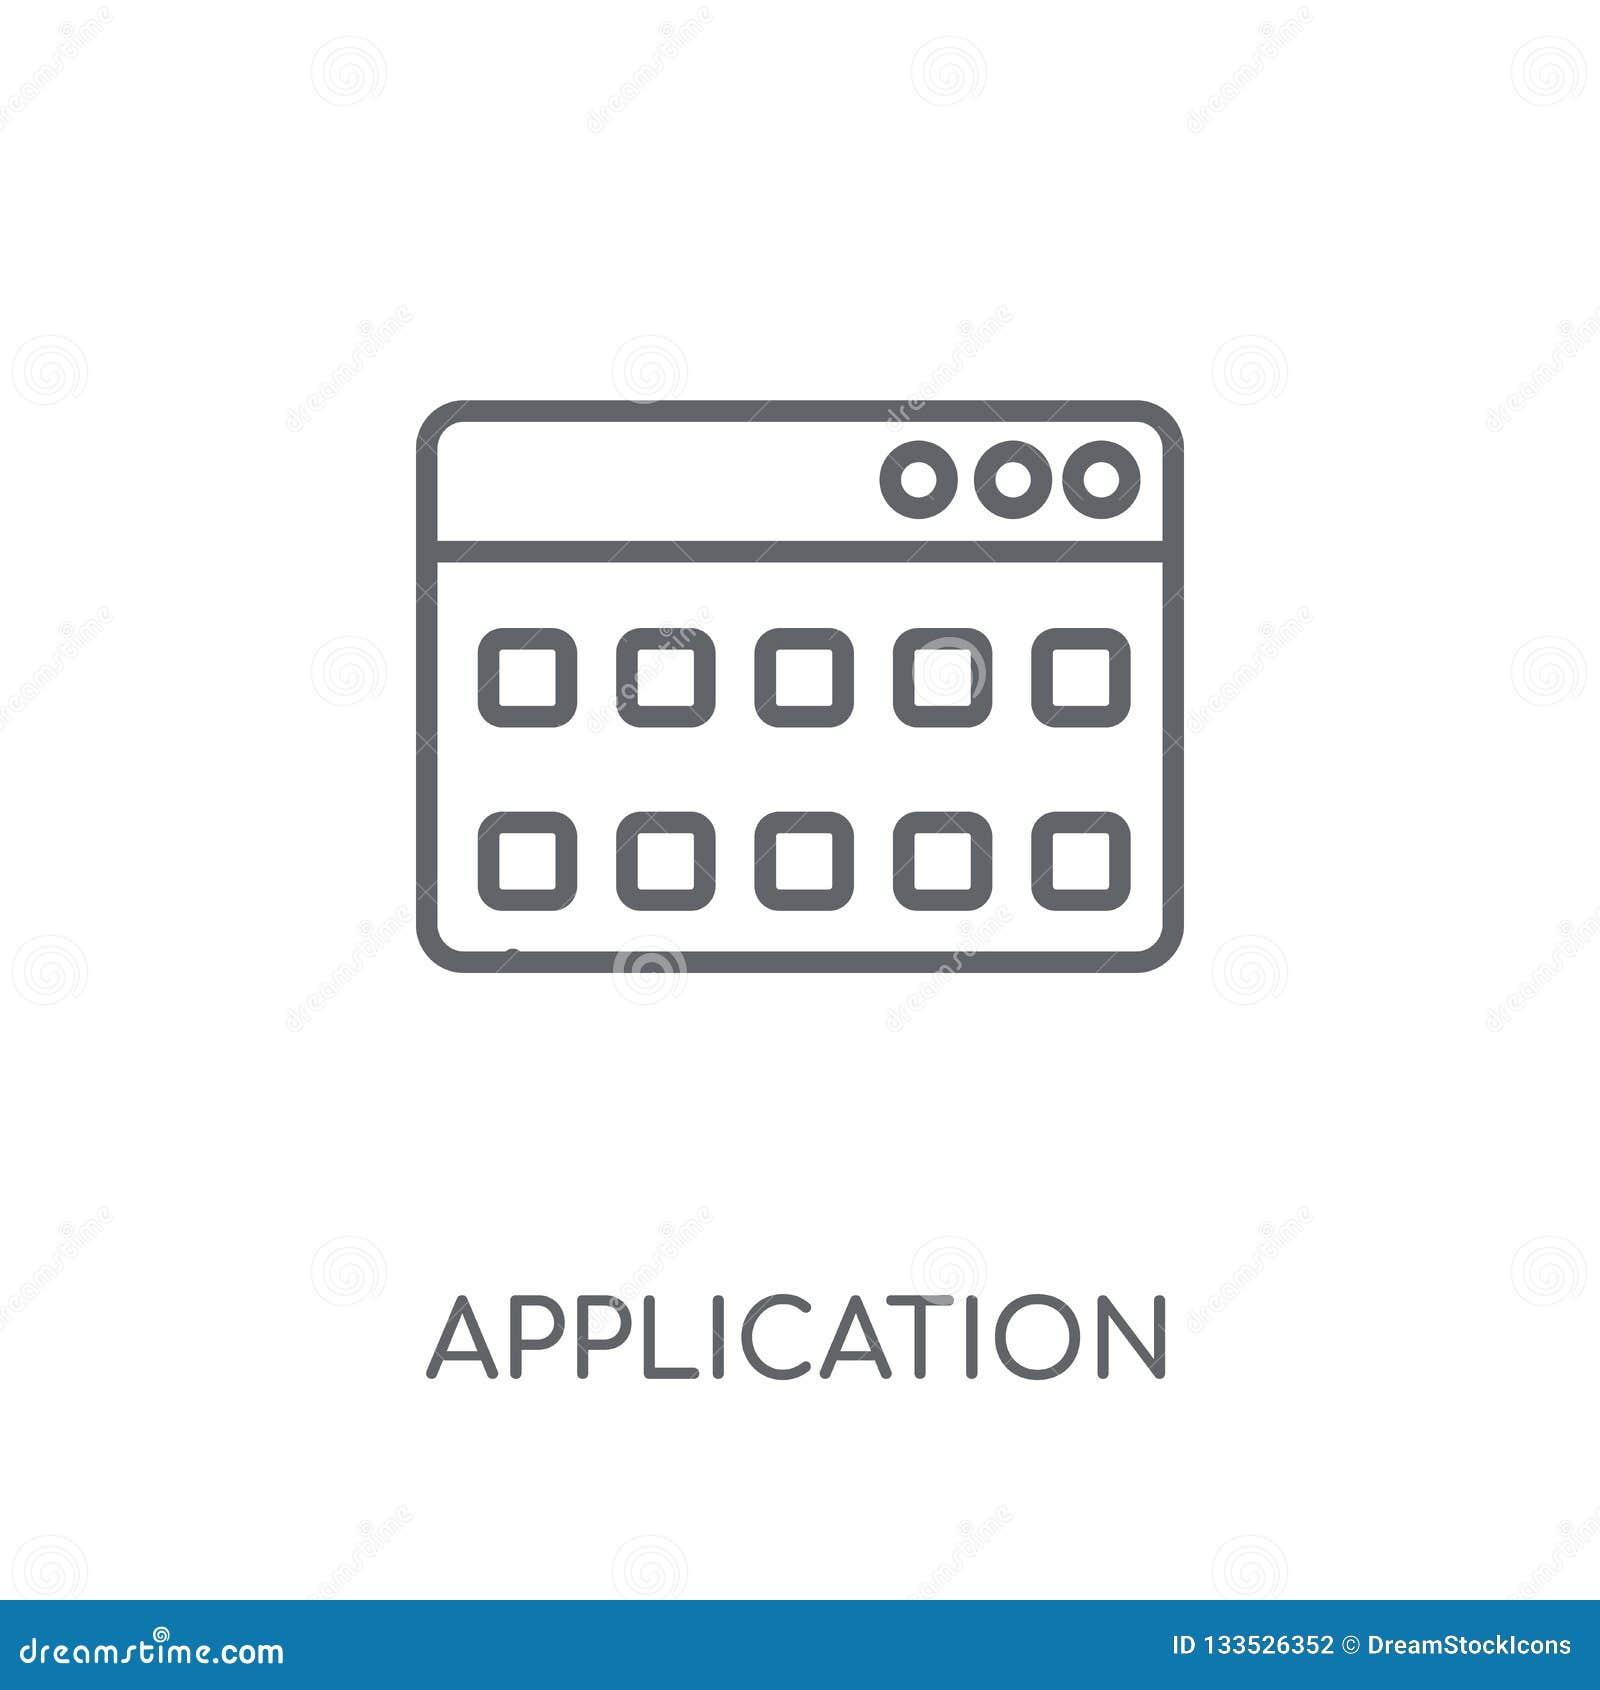 Lineare Ikone der Anwendung Modernes Entwurf Anwendungs-Logokonzept